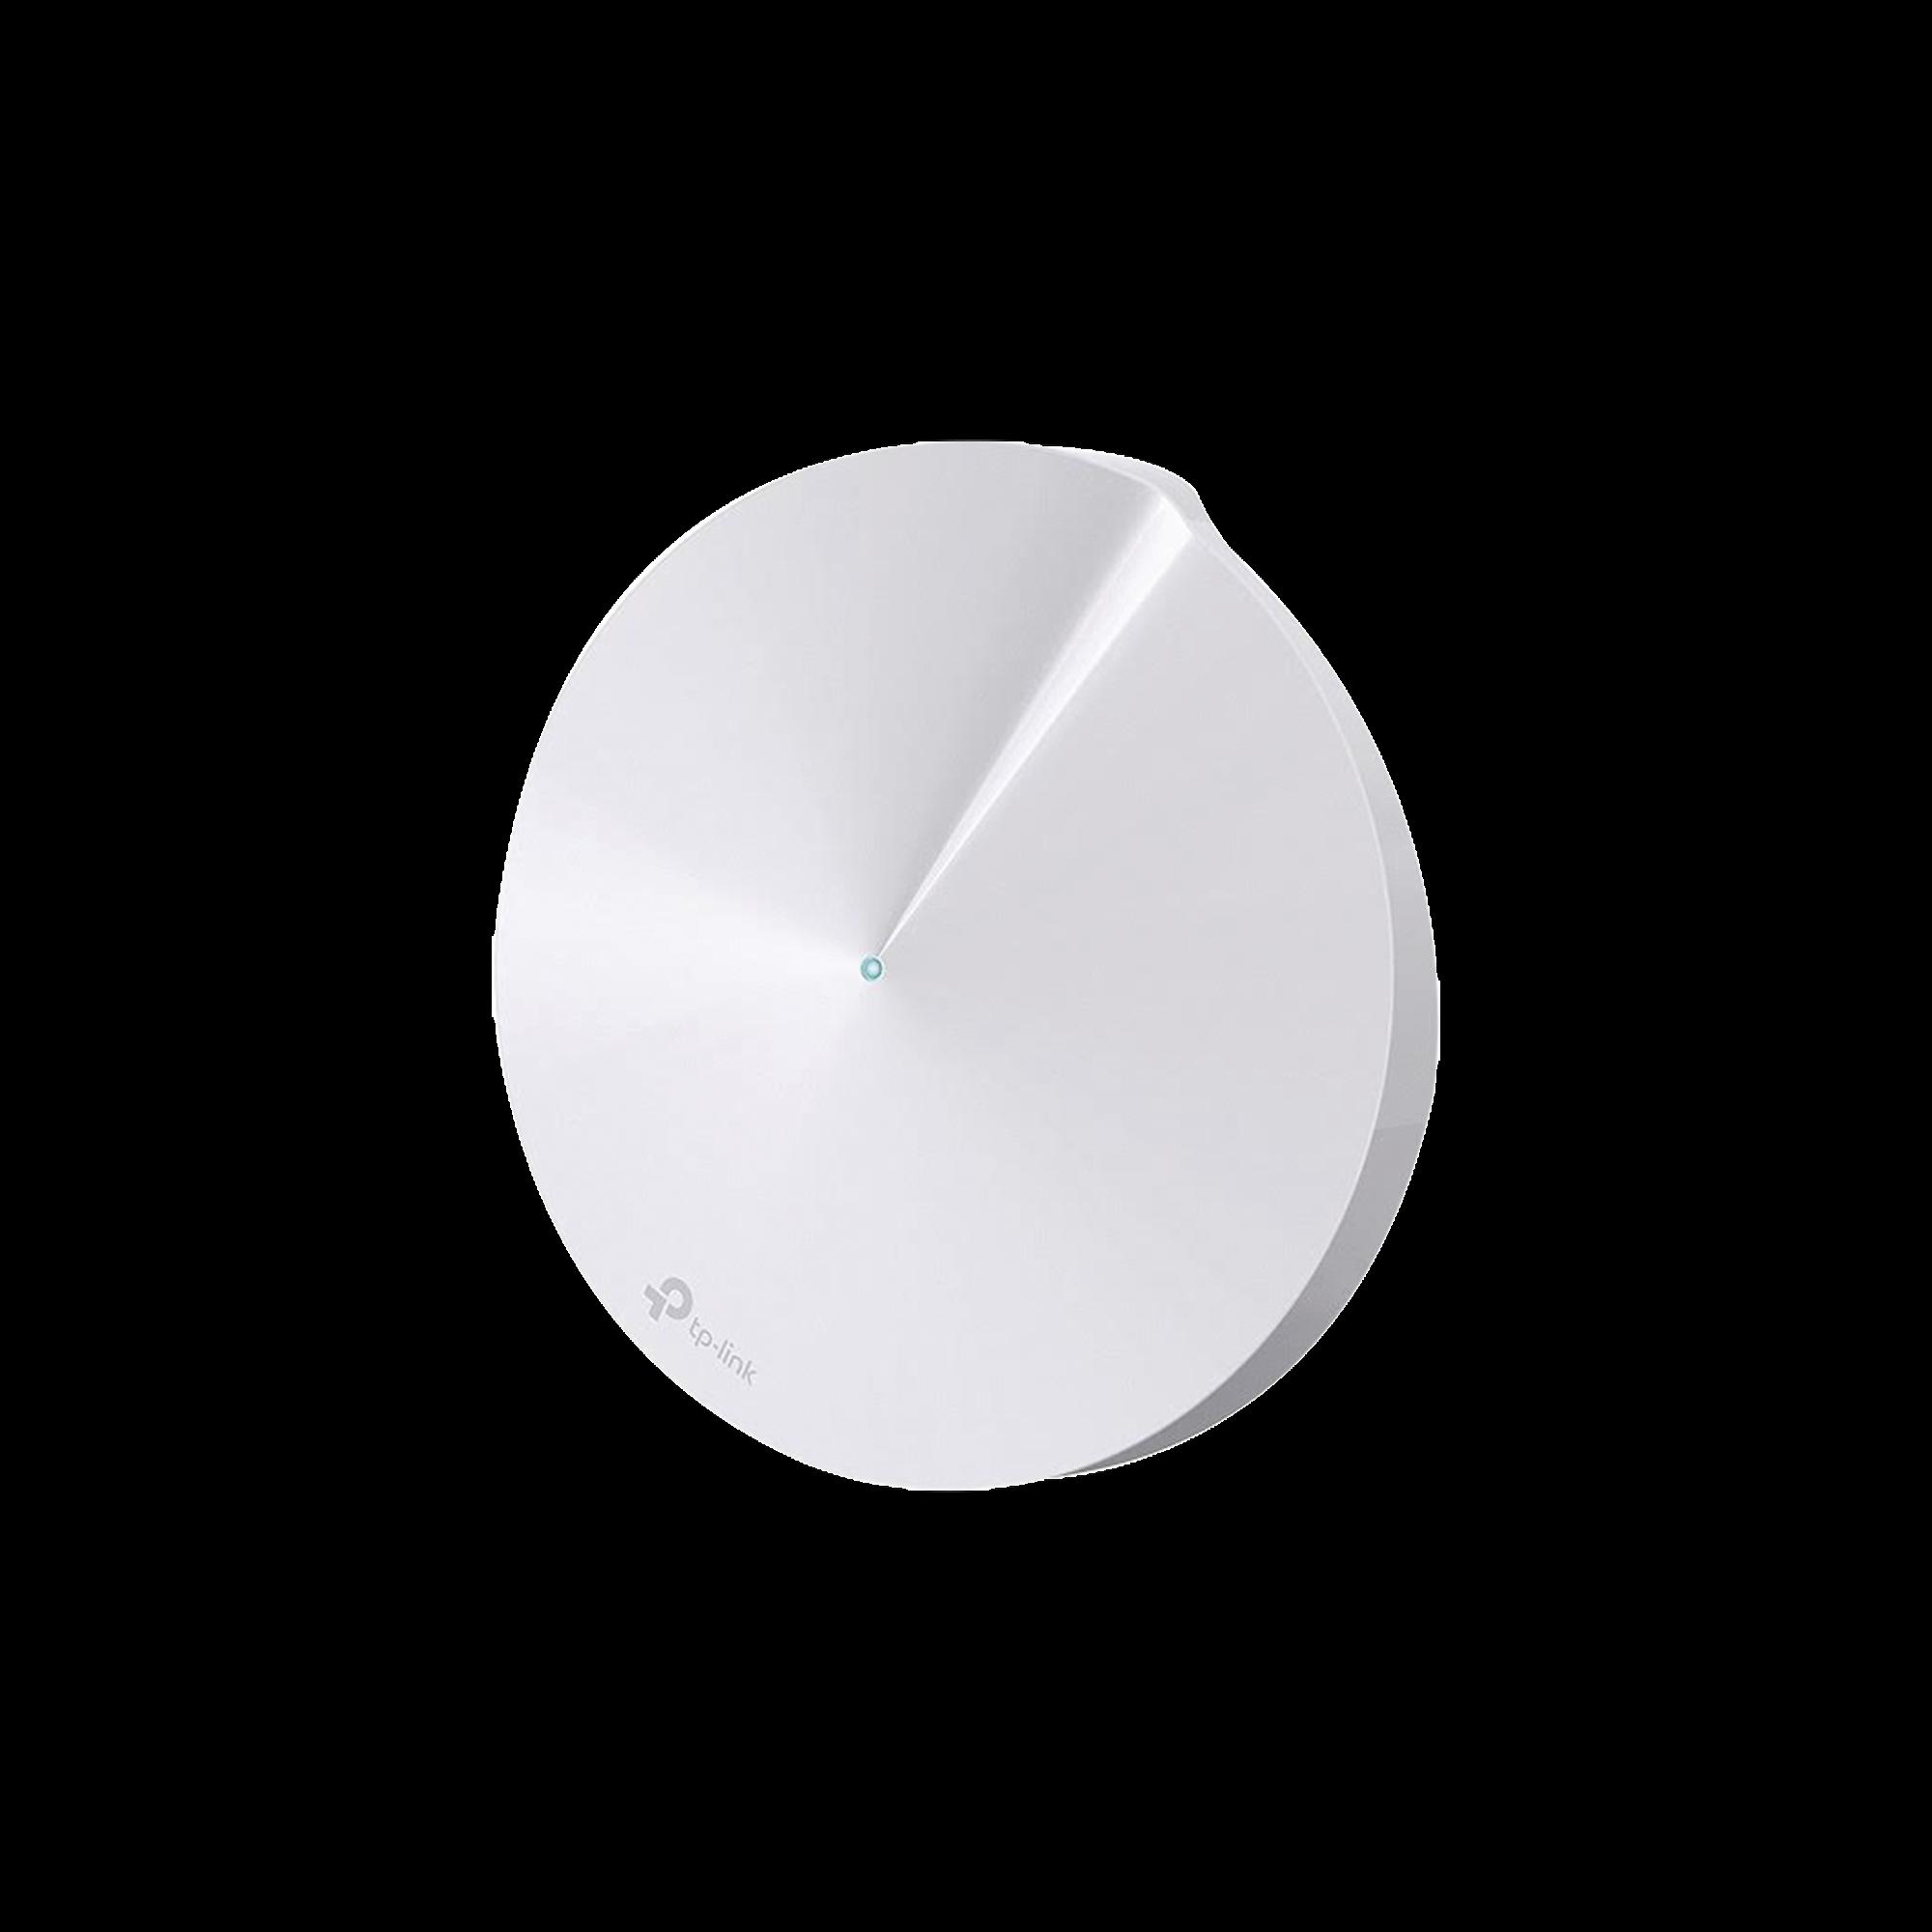 Router inalámbrico mesh para hogar, doble banda AC, doble puerto Gigabit, 4 antenas internas con seguridad de HomeCare gratuito por 3 años